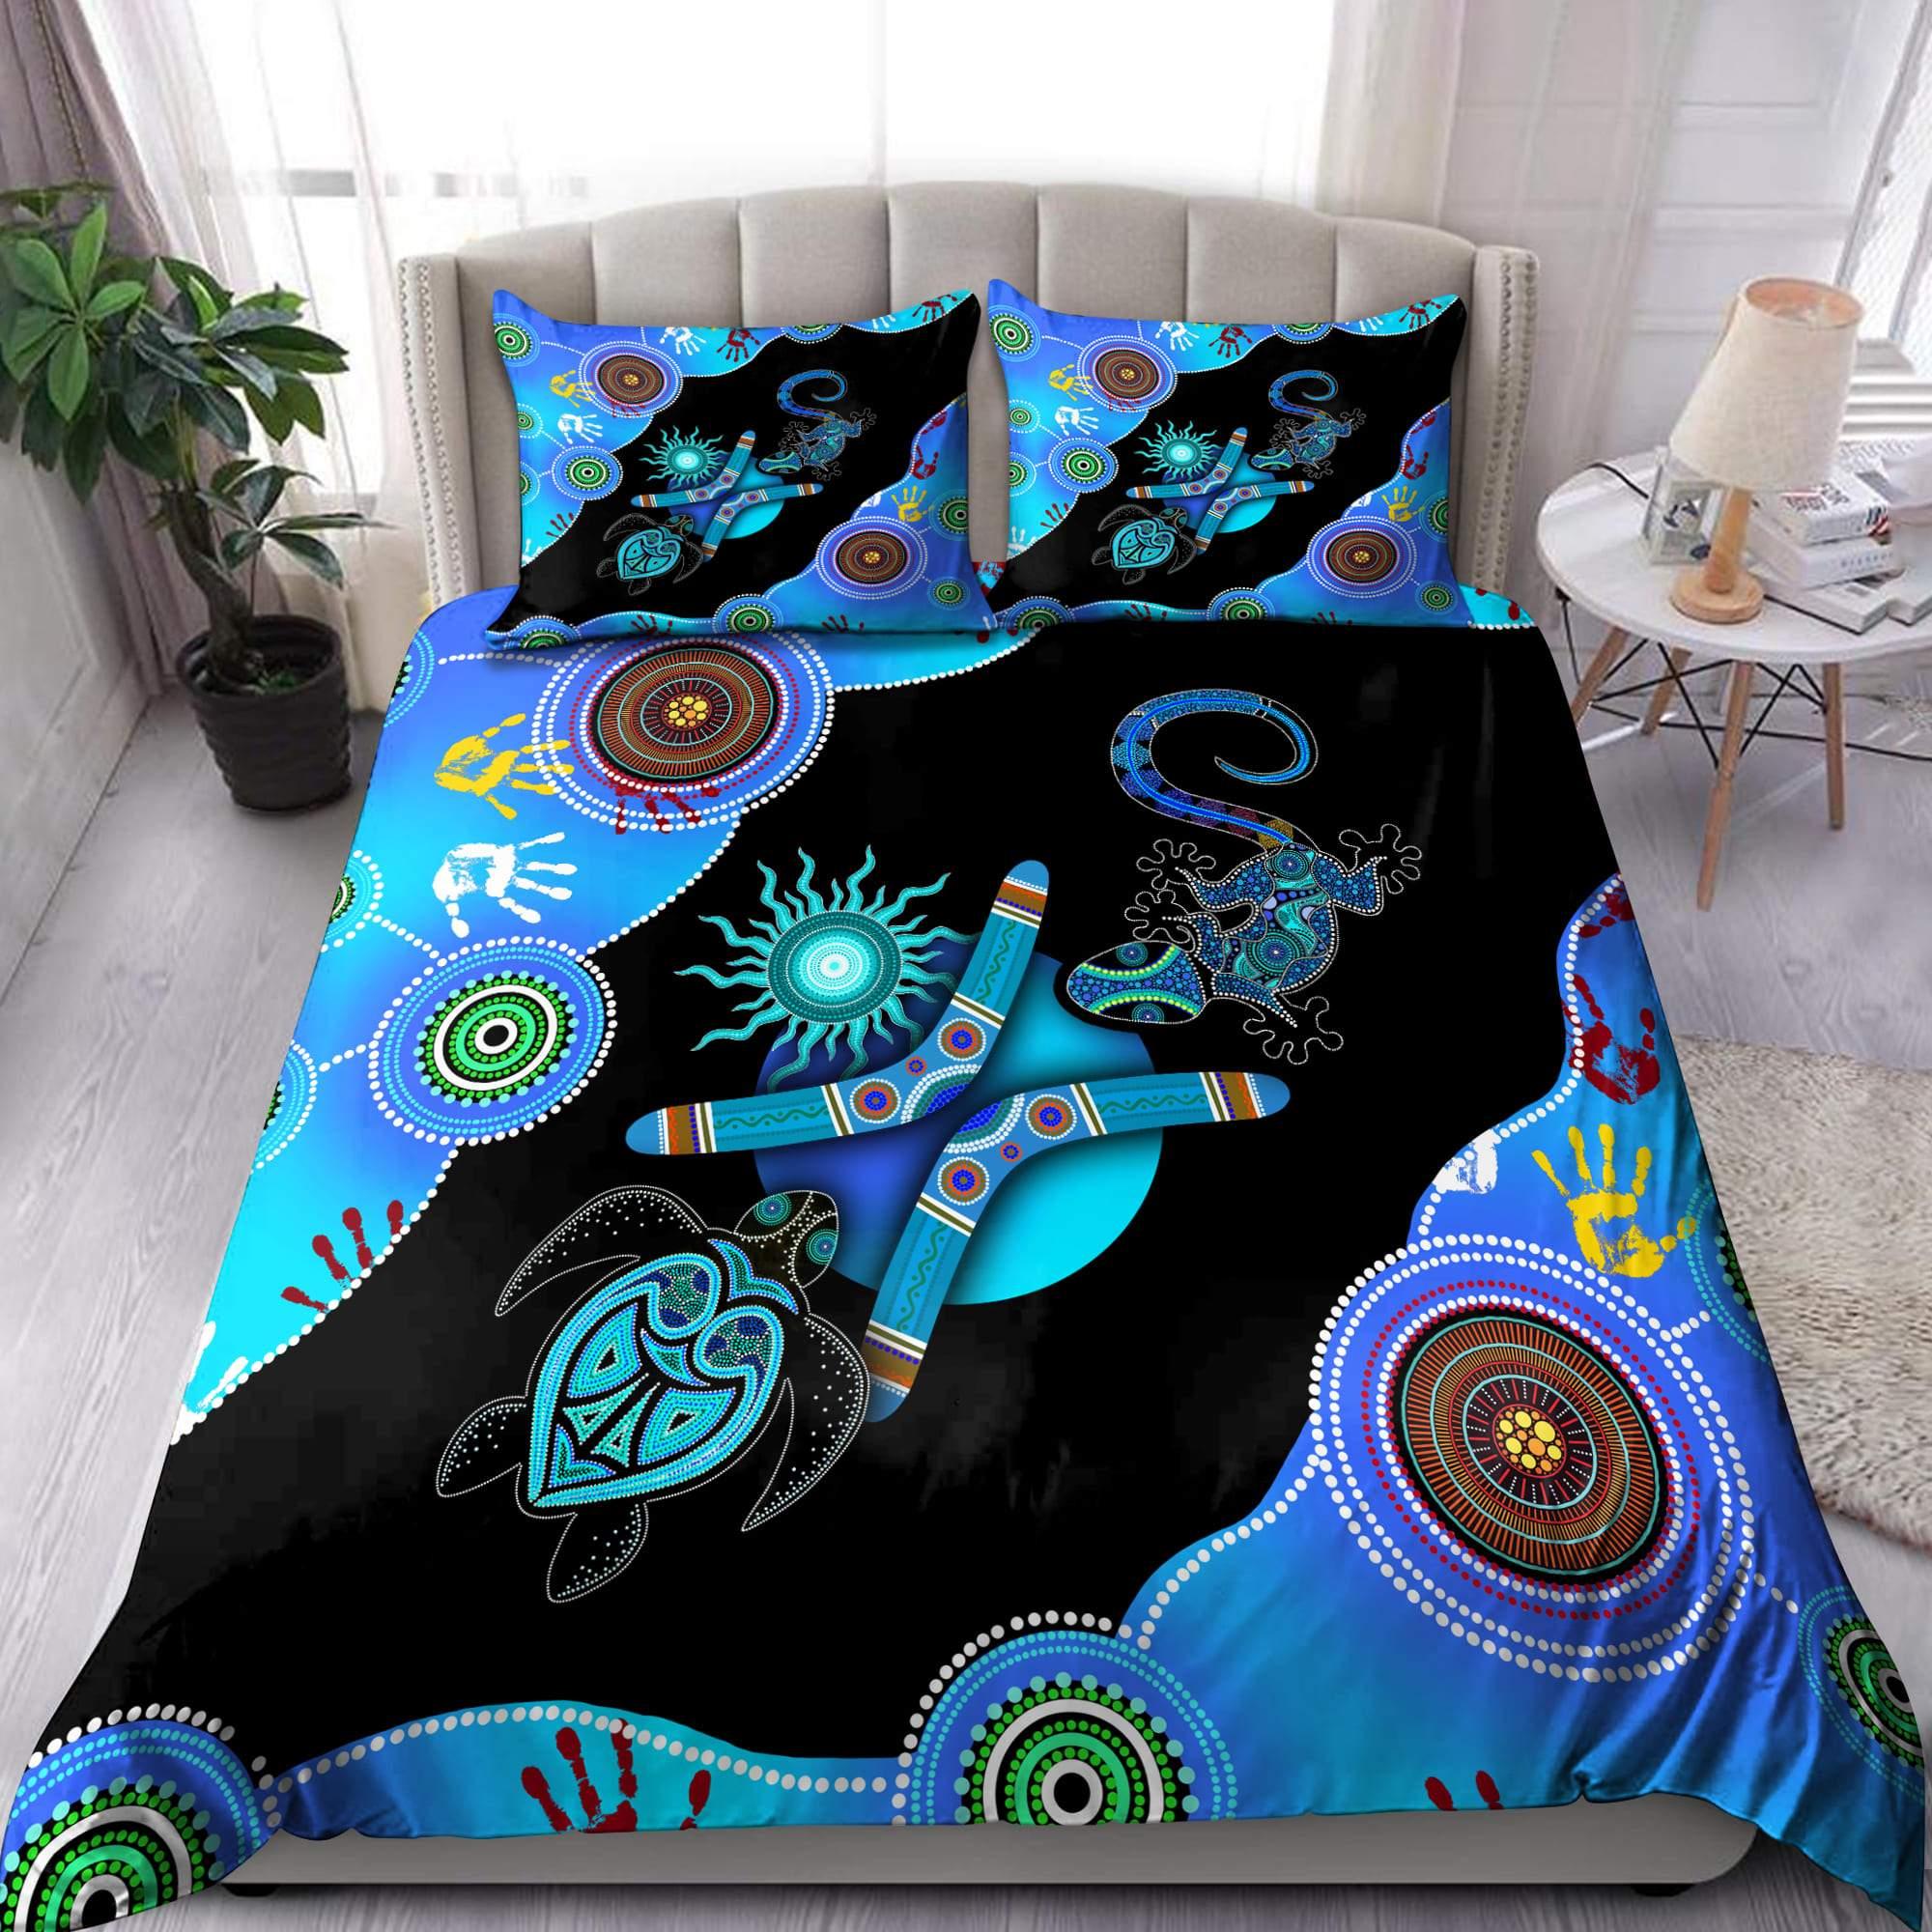 Aboriginal Naidoc Week Blue Turtle Lizard Bedding set